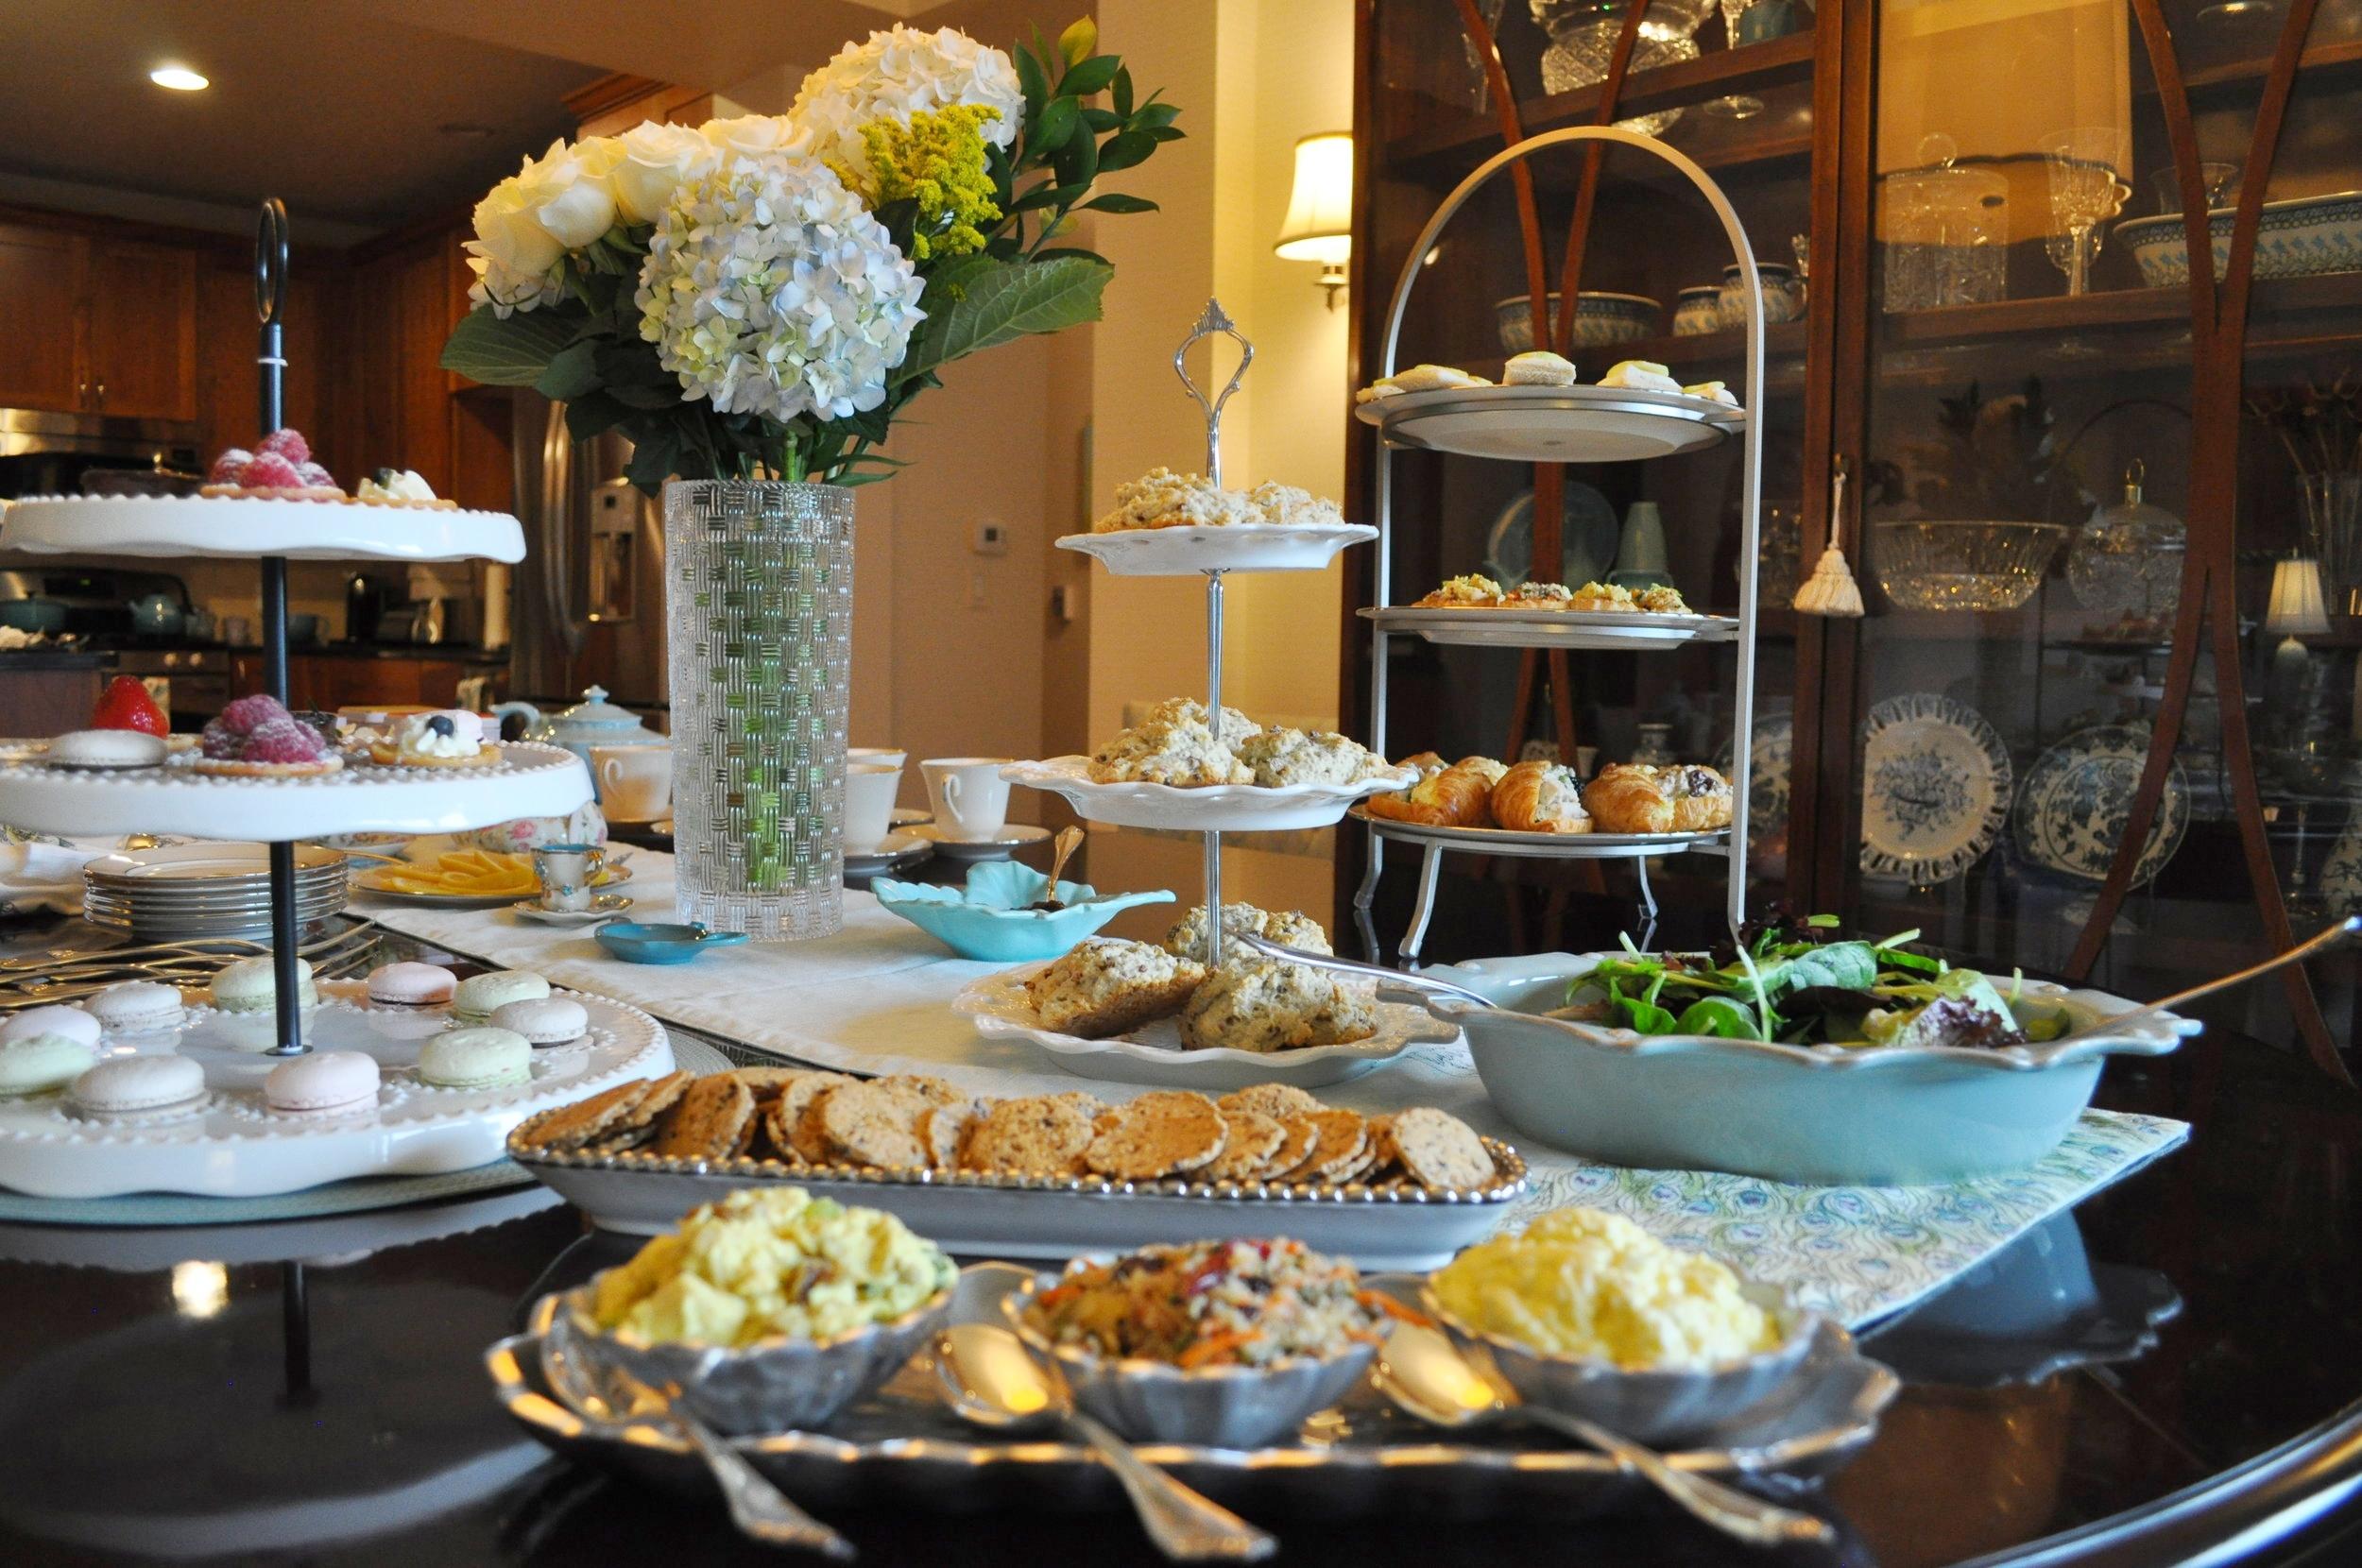 Tea party food display.